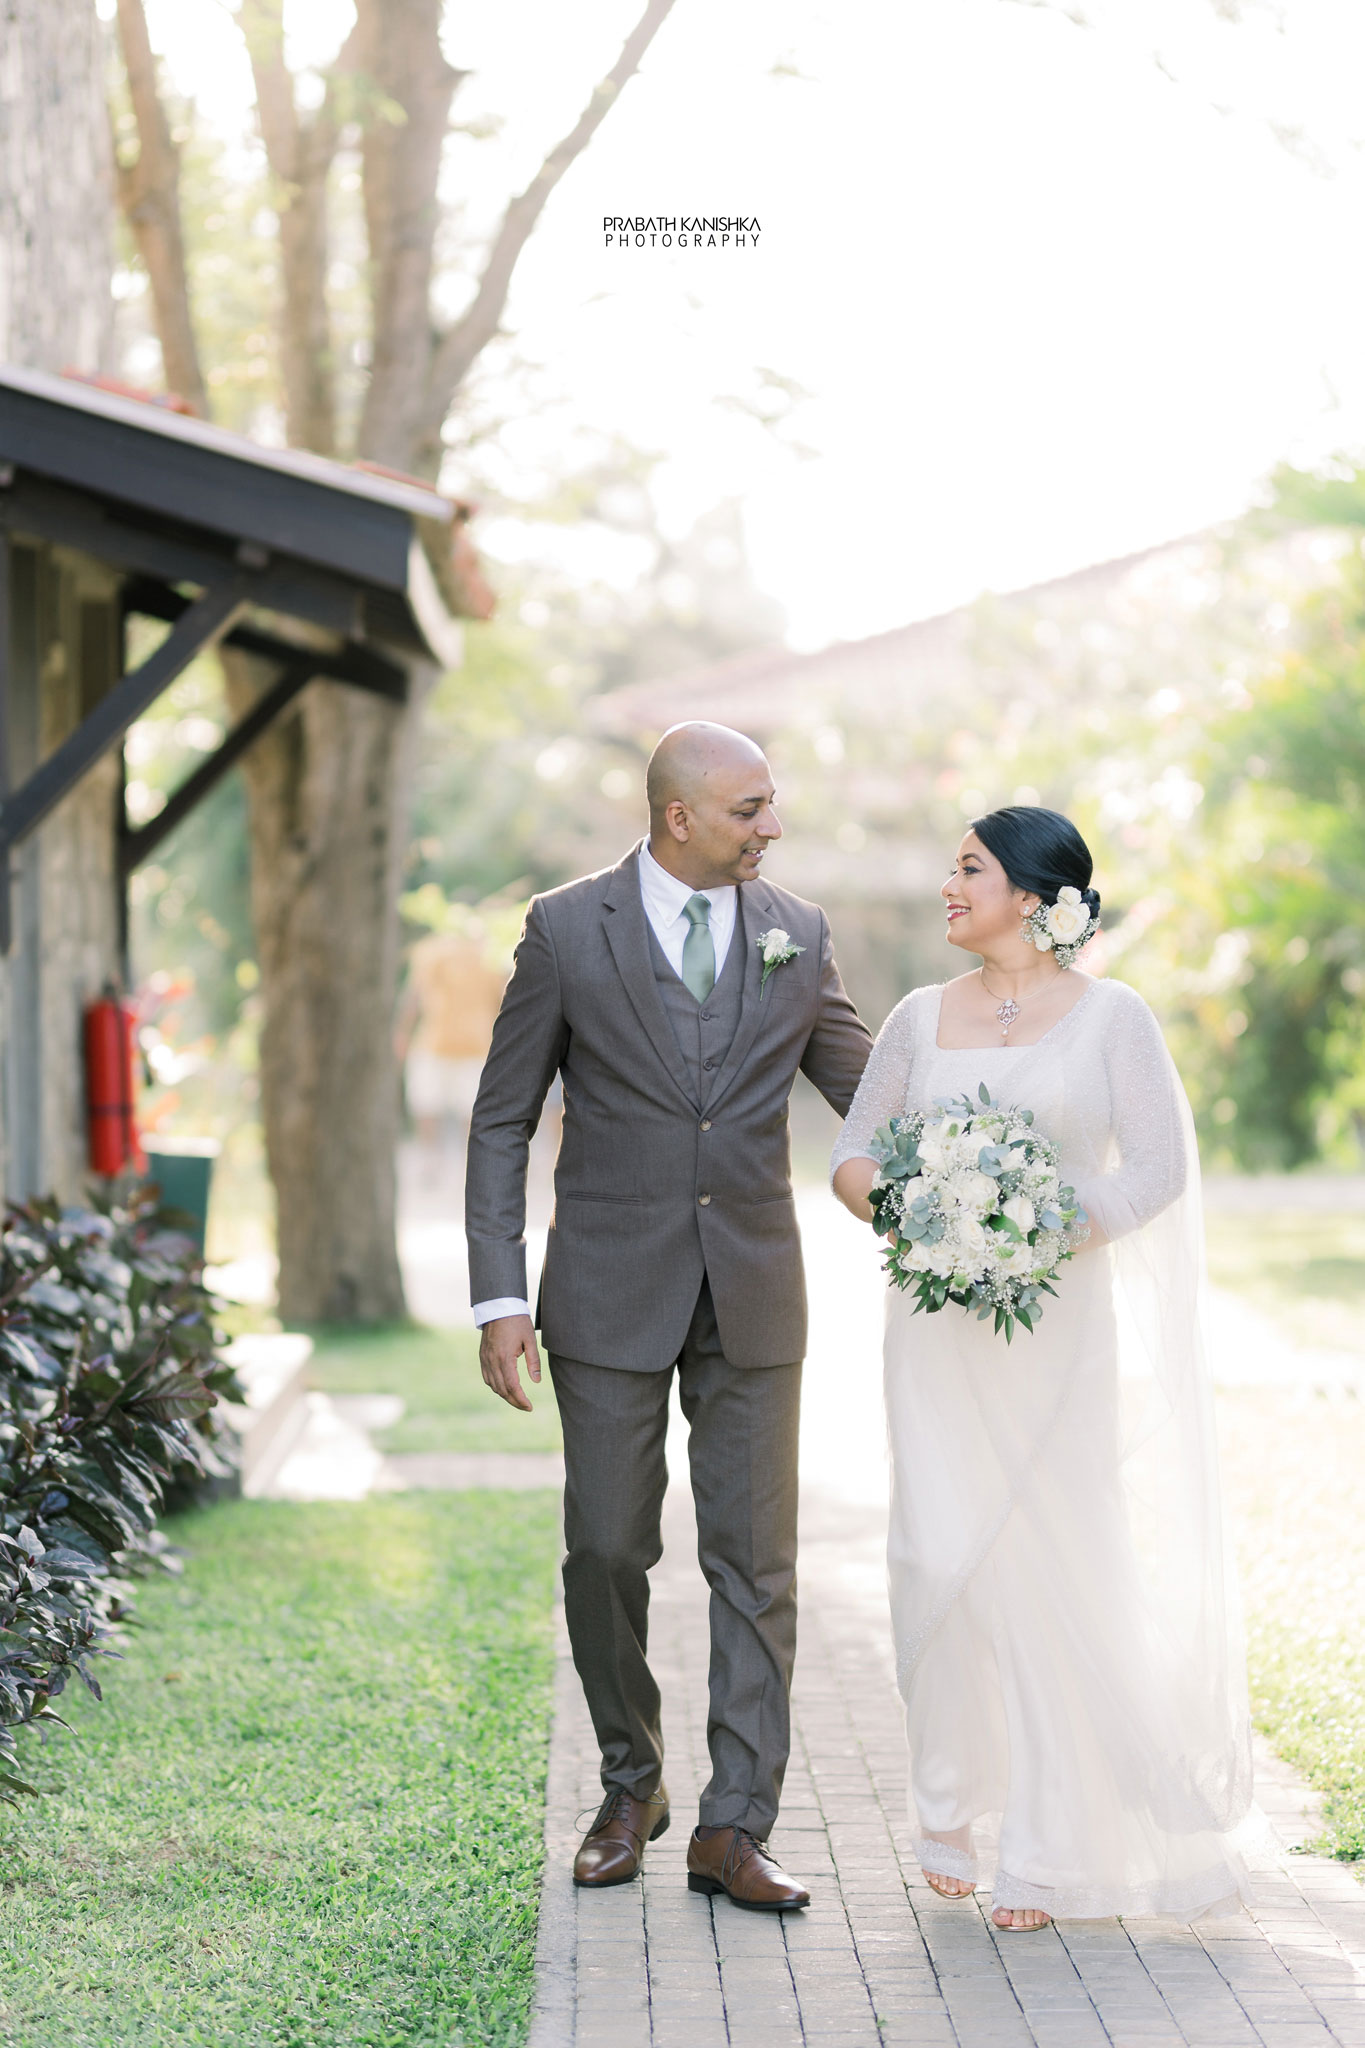 Chamila & Ranga - Prabath Kanishka Wedding Photography